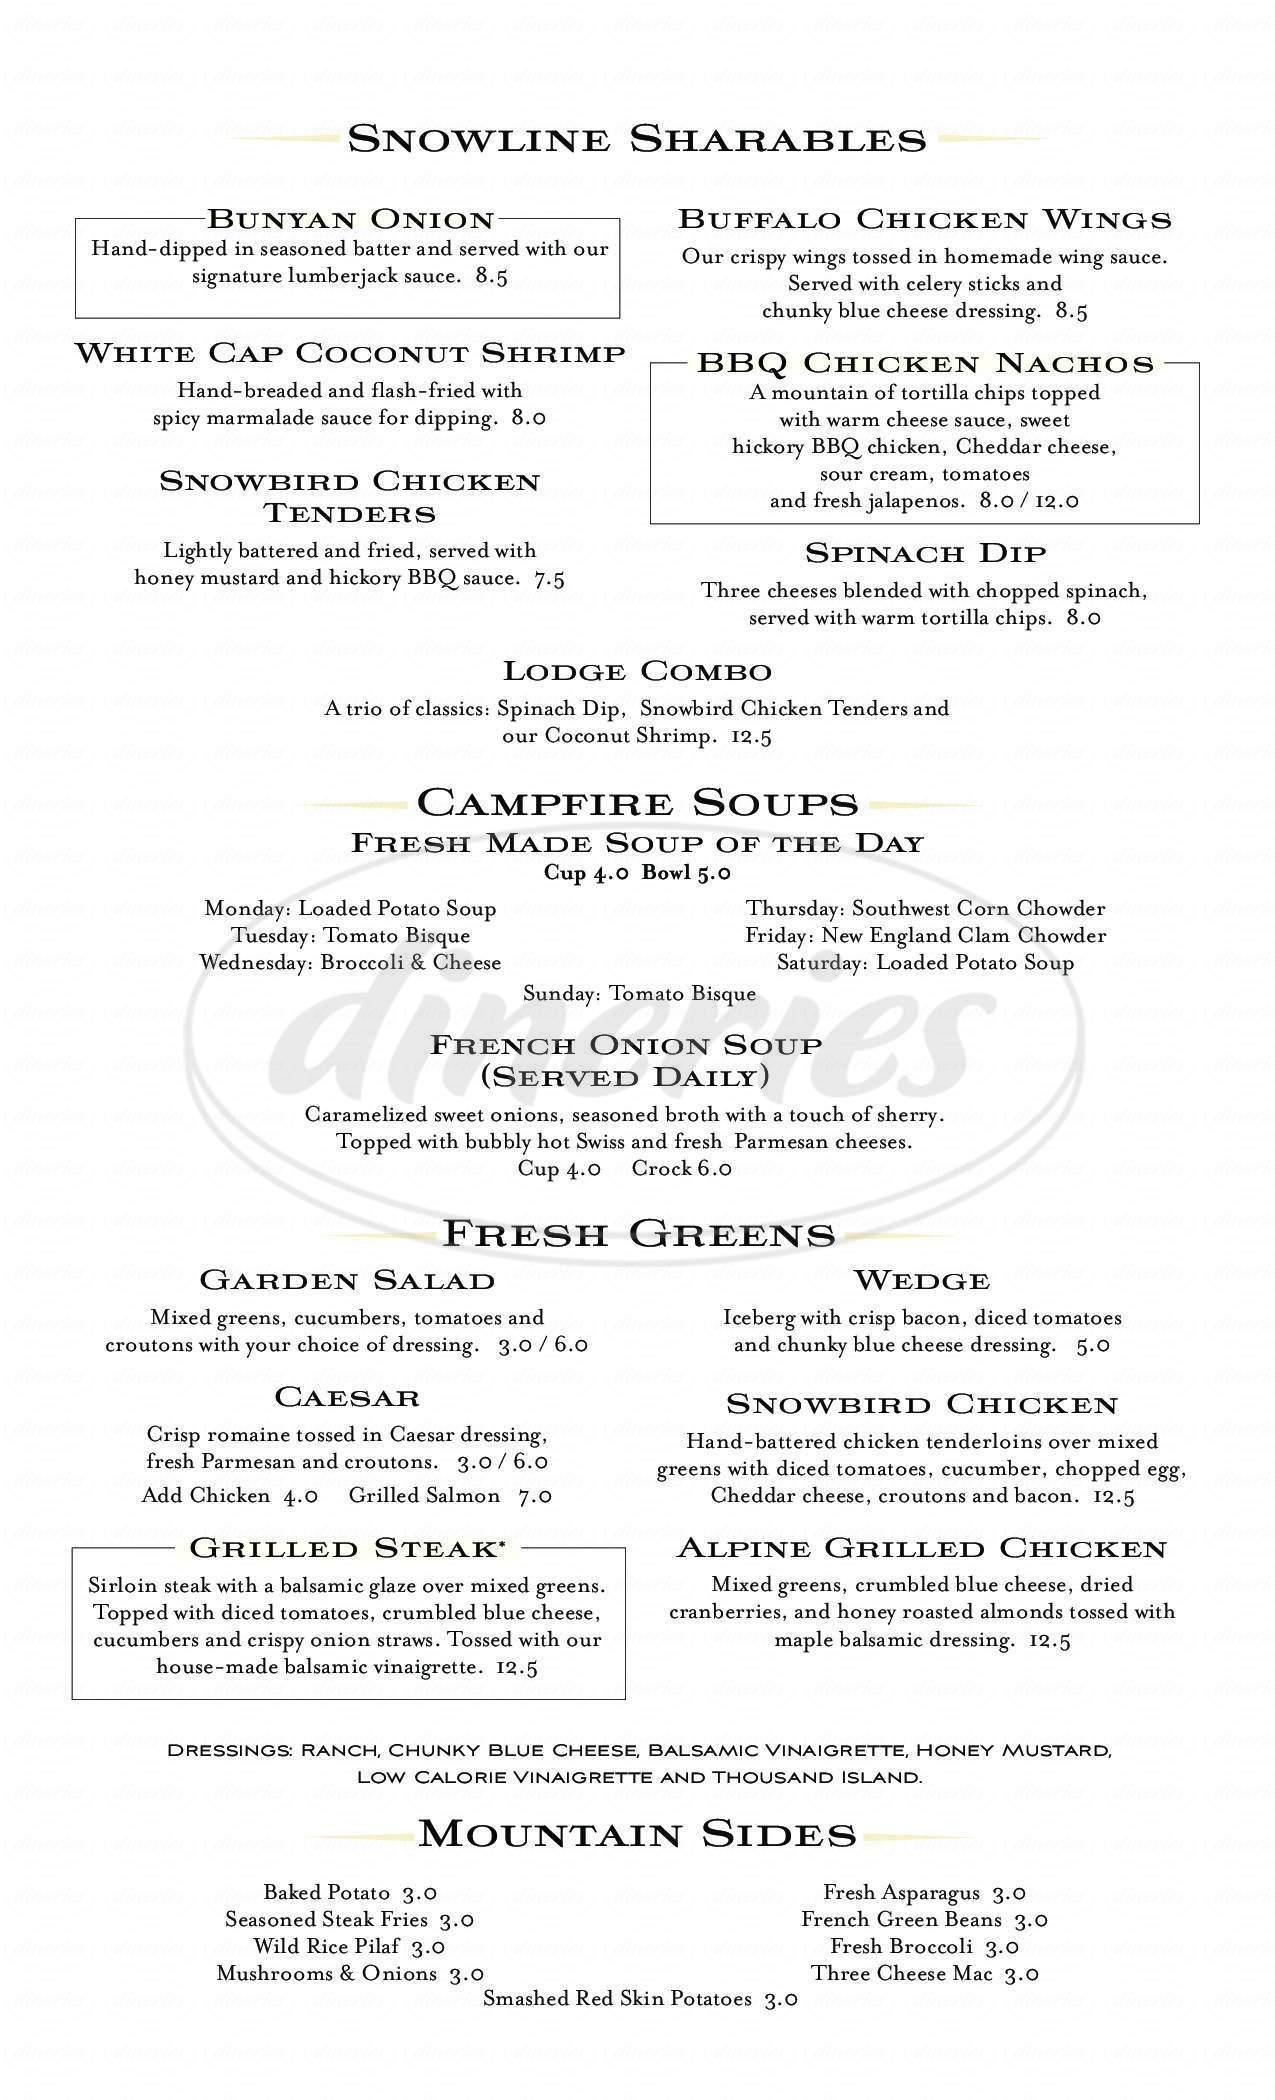 menu for Bugaboo Creek Steak House